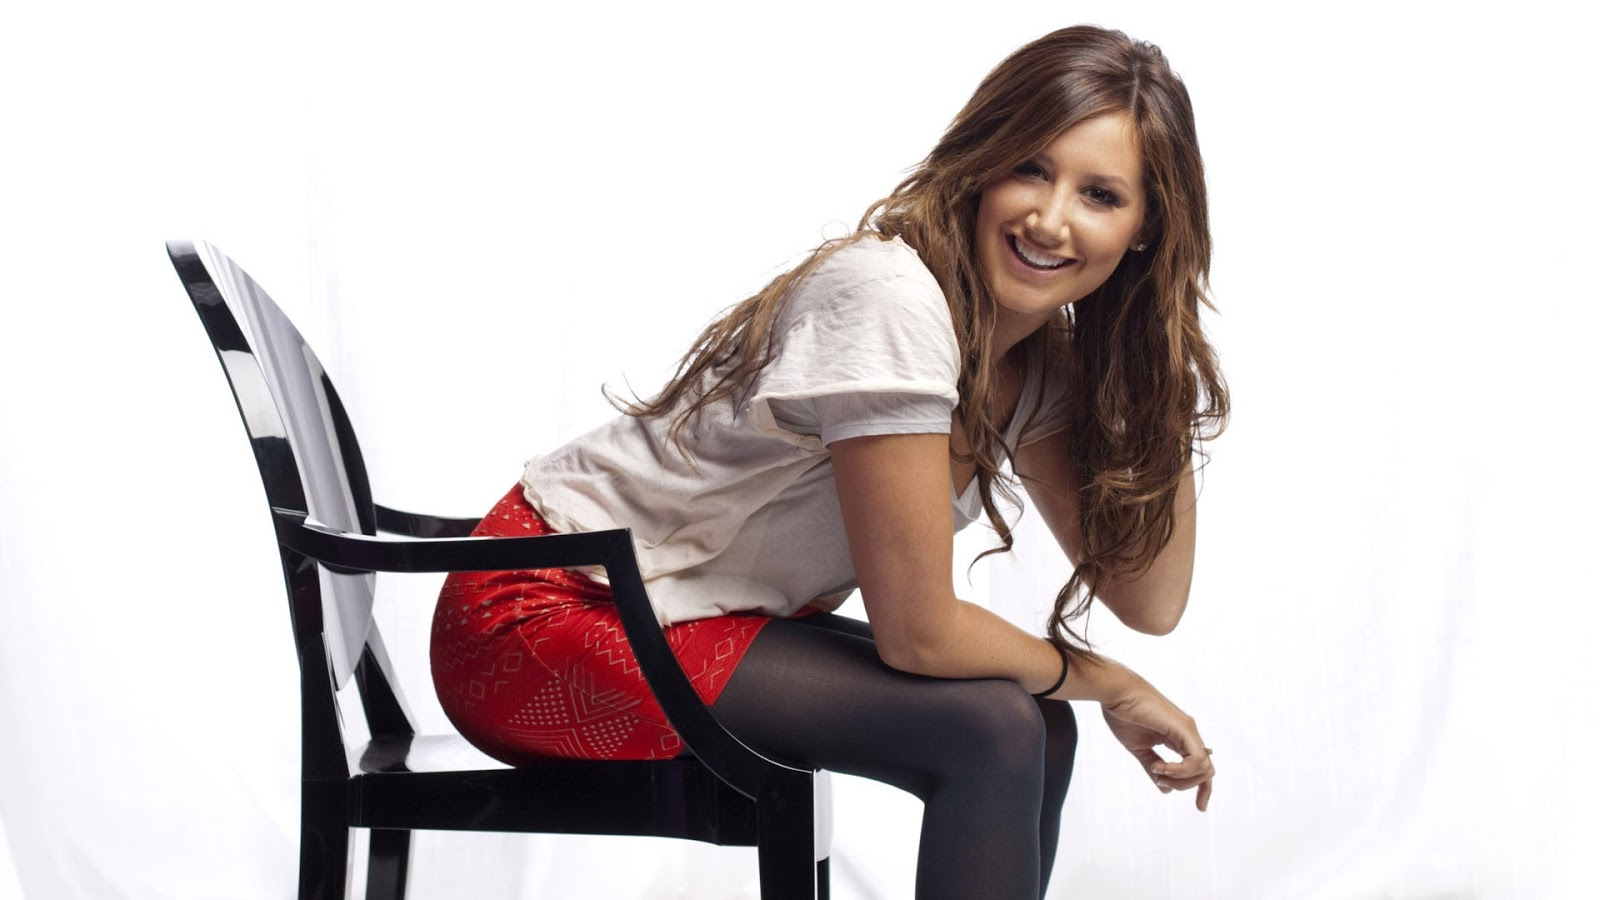 Ashley Tisdale Hot Desktop Wallpaper   HD Wallpapers (High Definition)   Celebrity HD Desktop ...